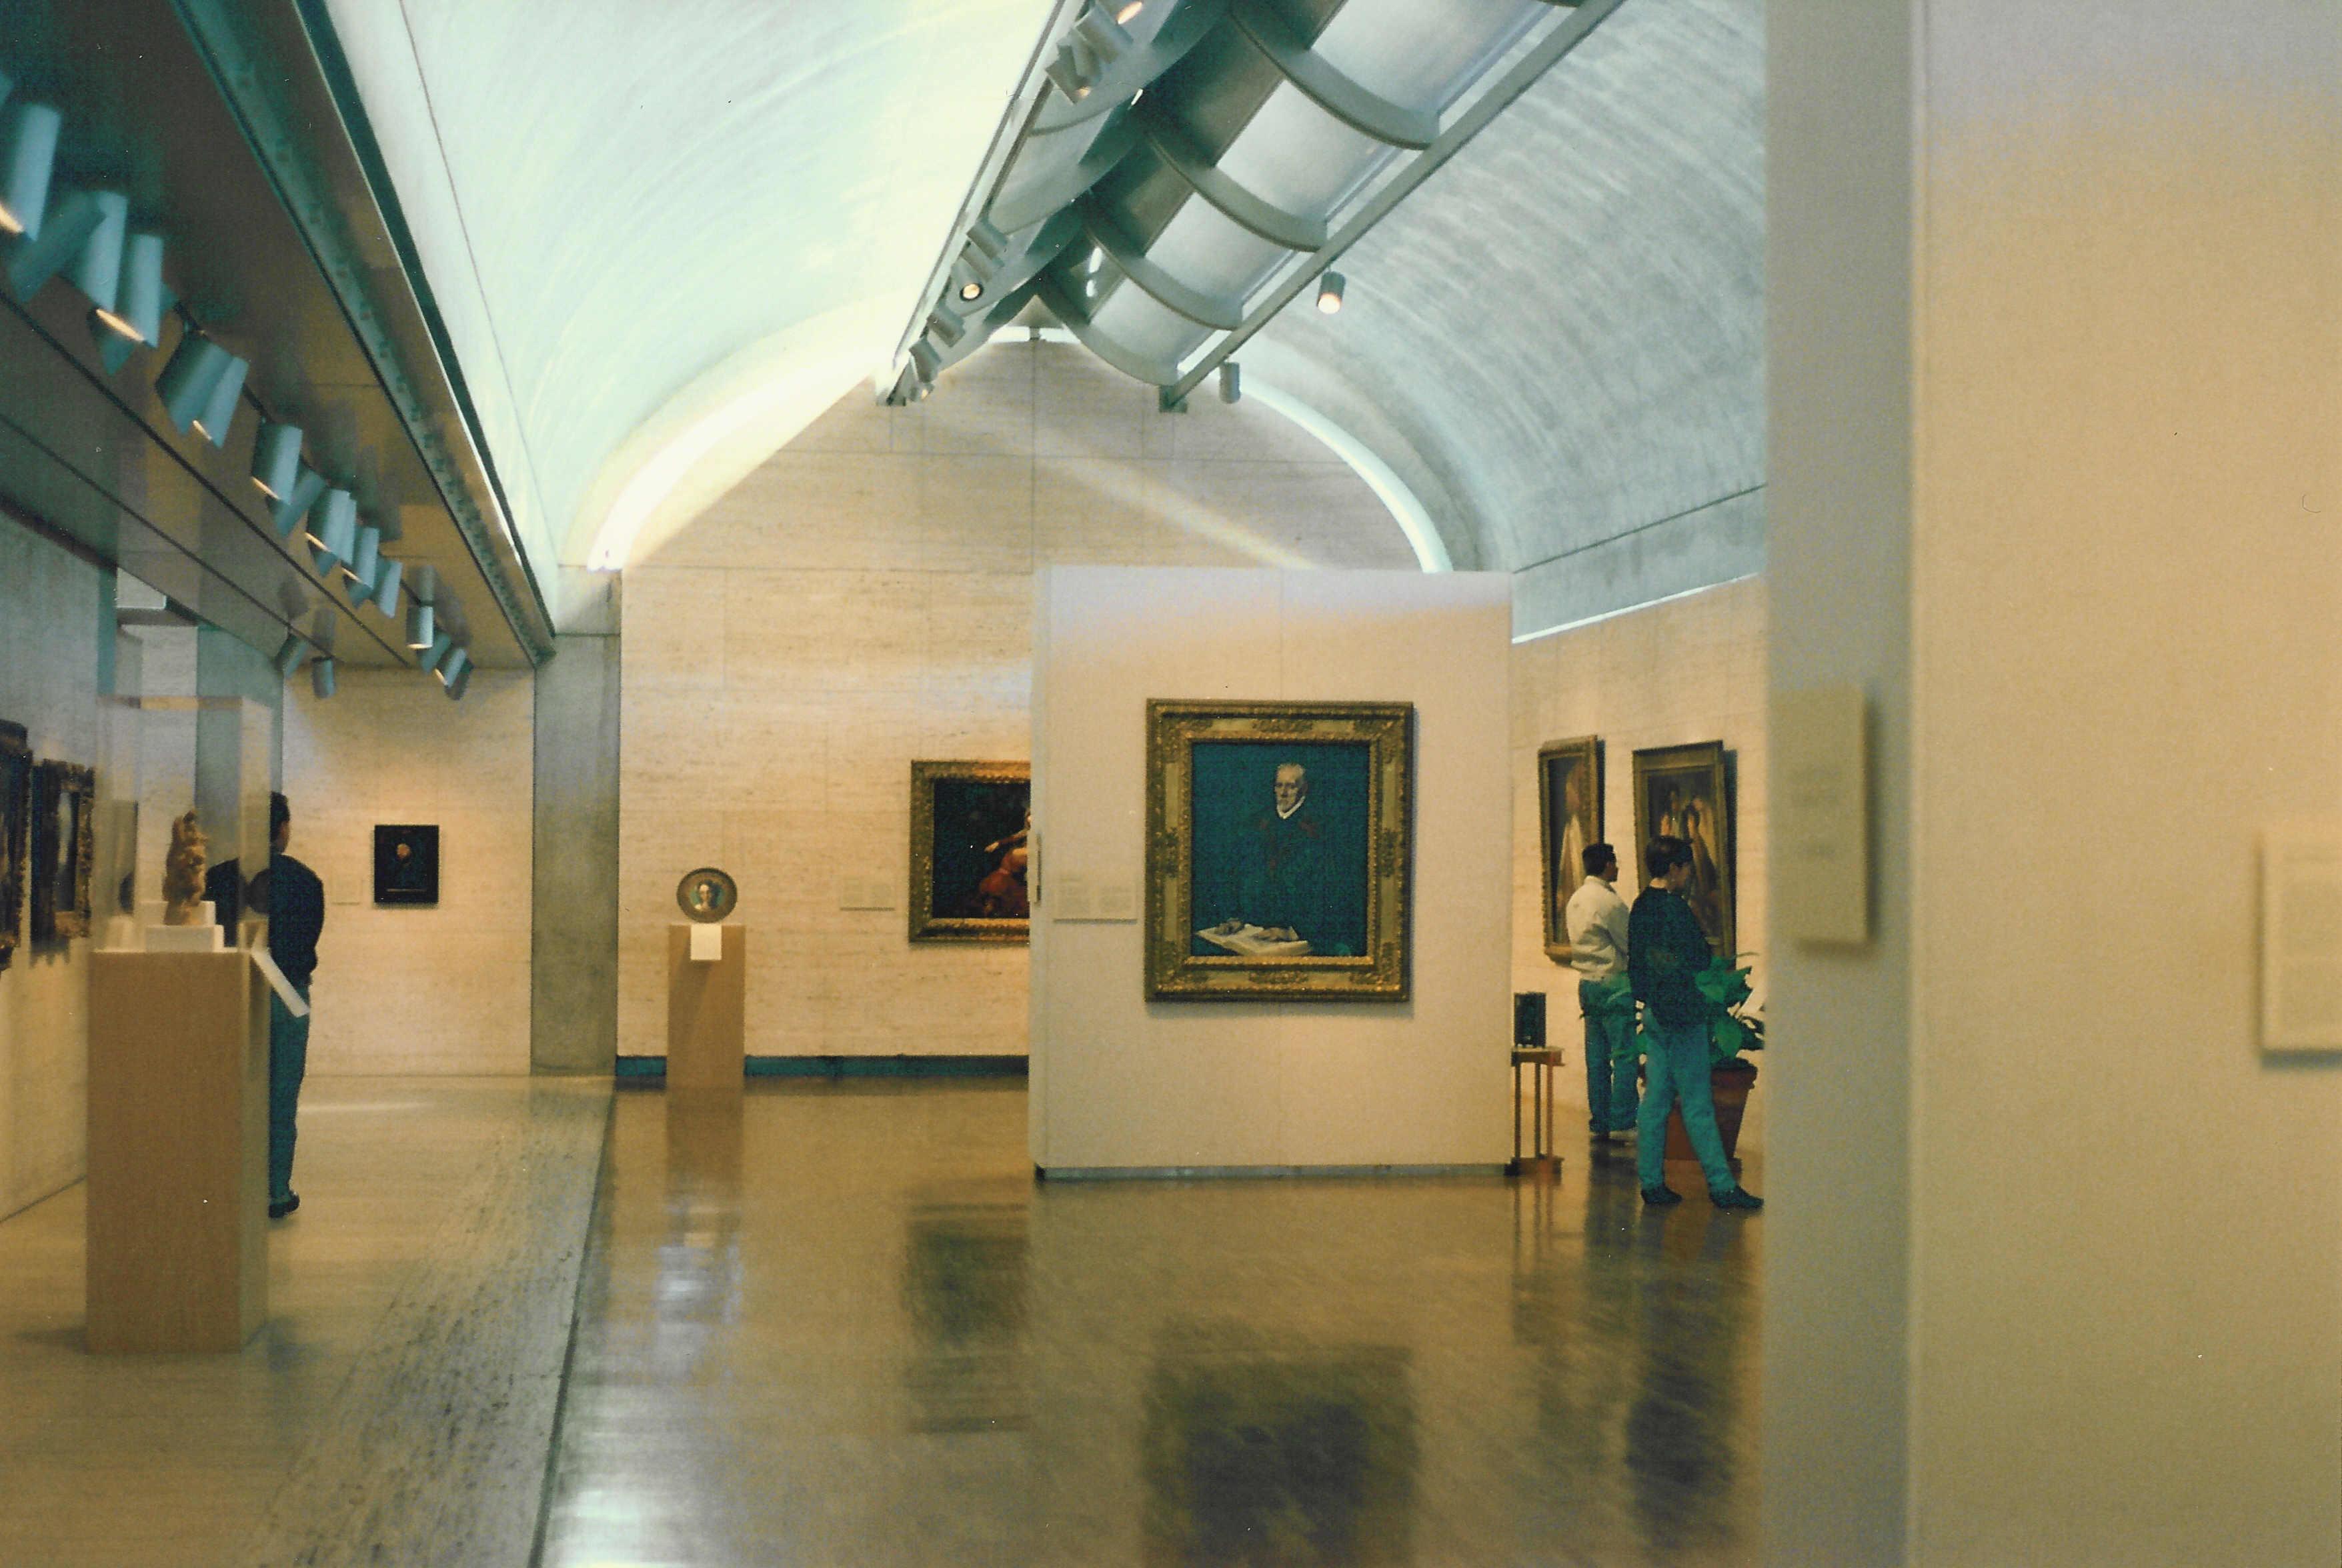 Museum Of Arts And Design Inside : Archivo kimbell art museum interior g wikipedia la